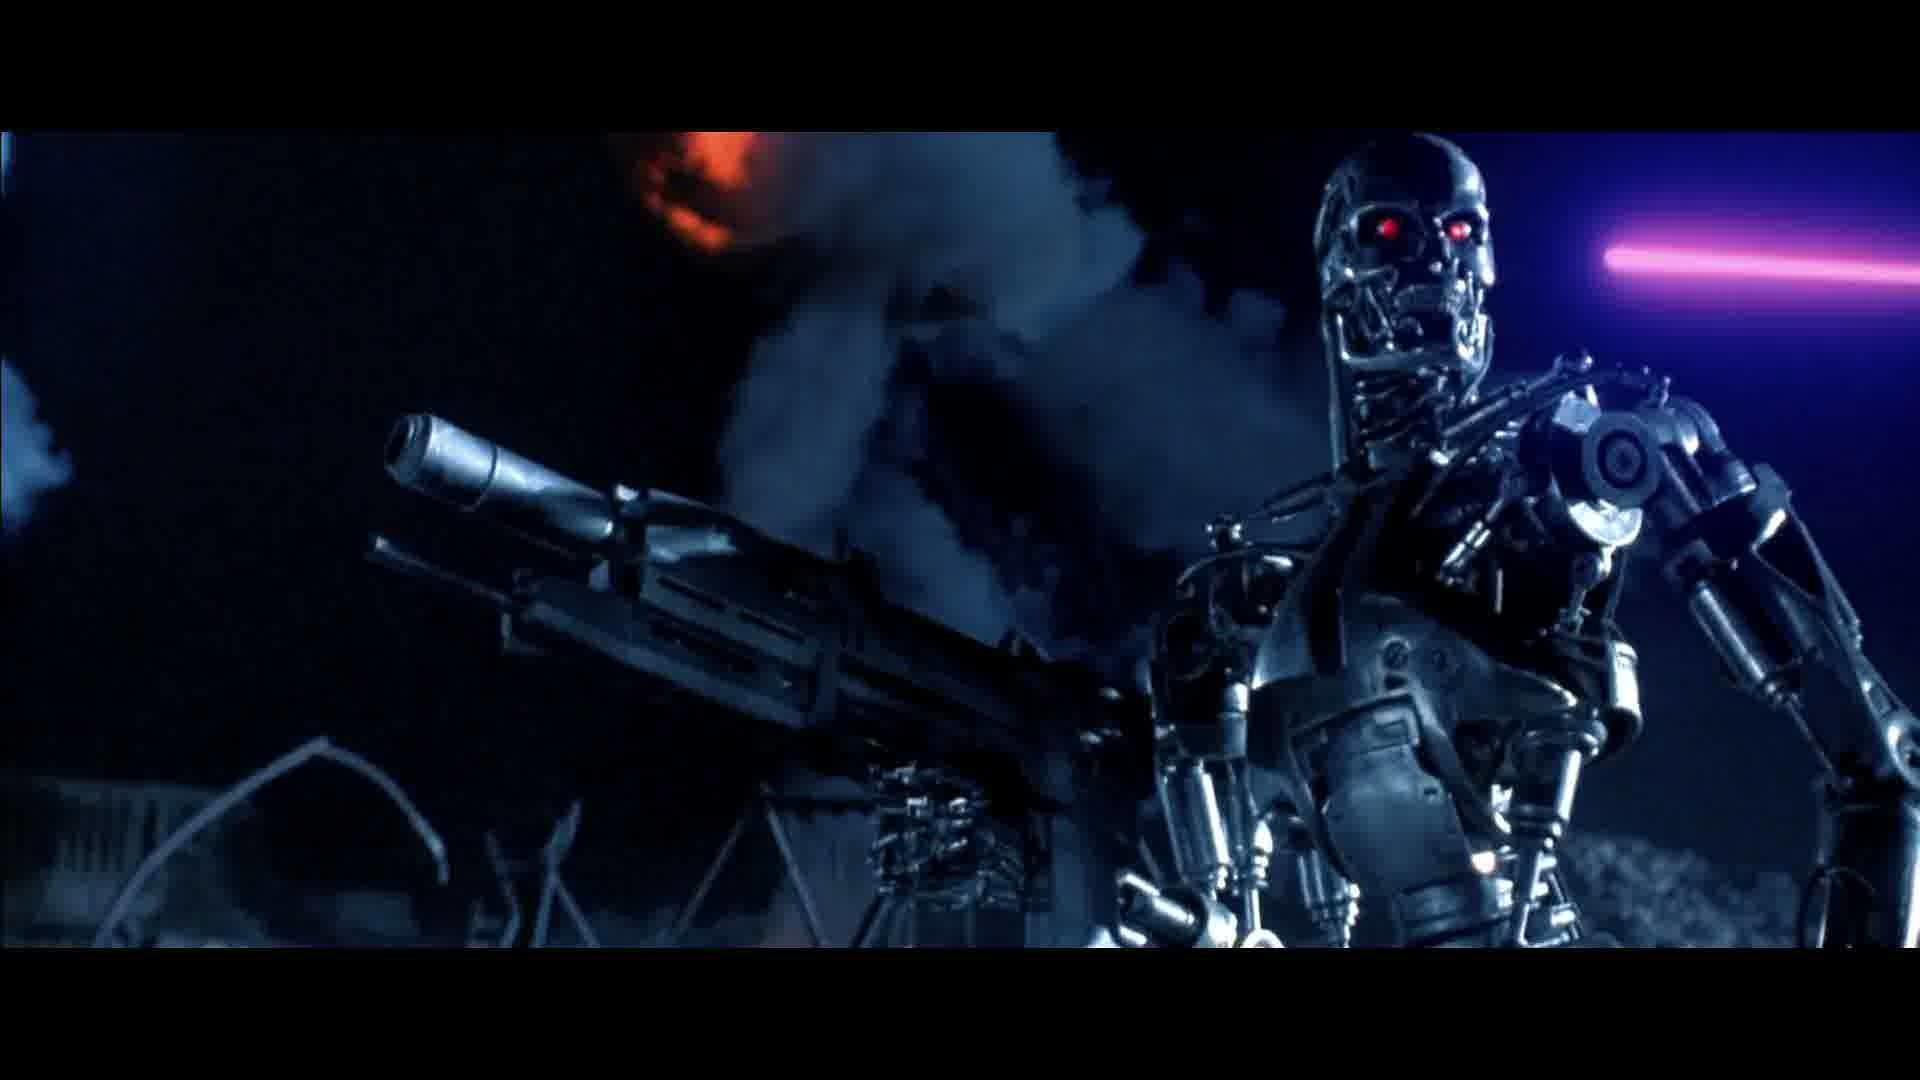 Res: 1920x1080, Terminator 2 Wallpaper